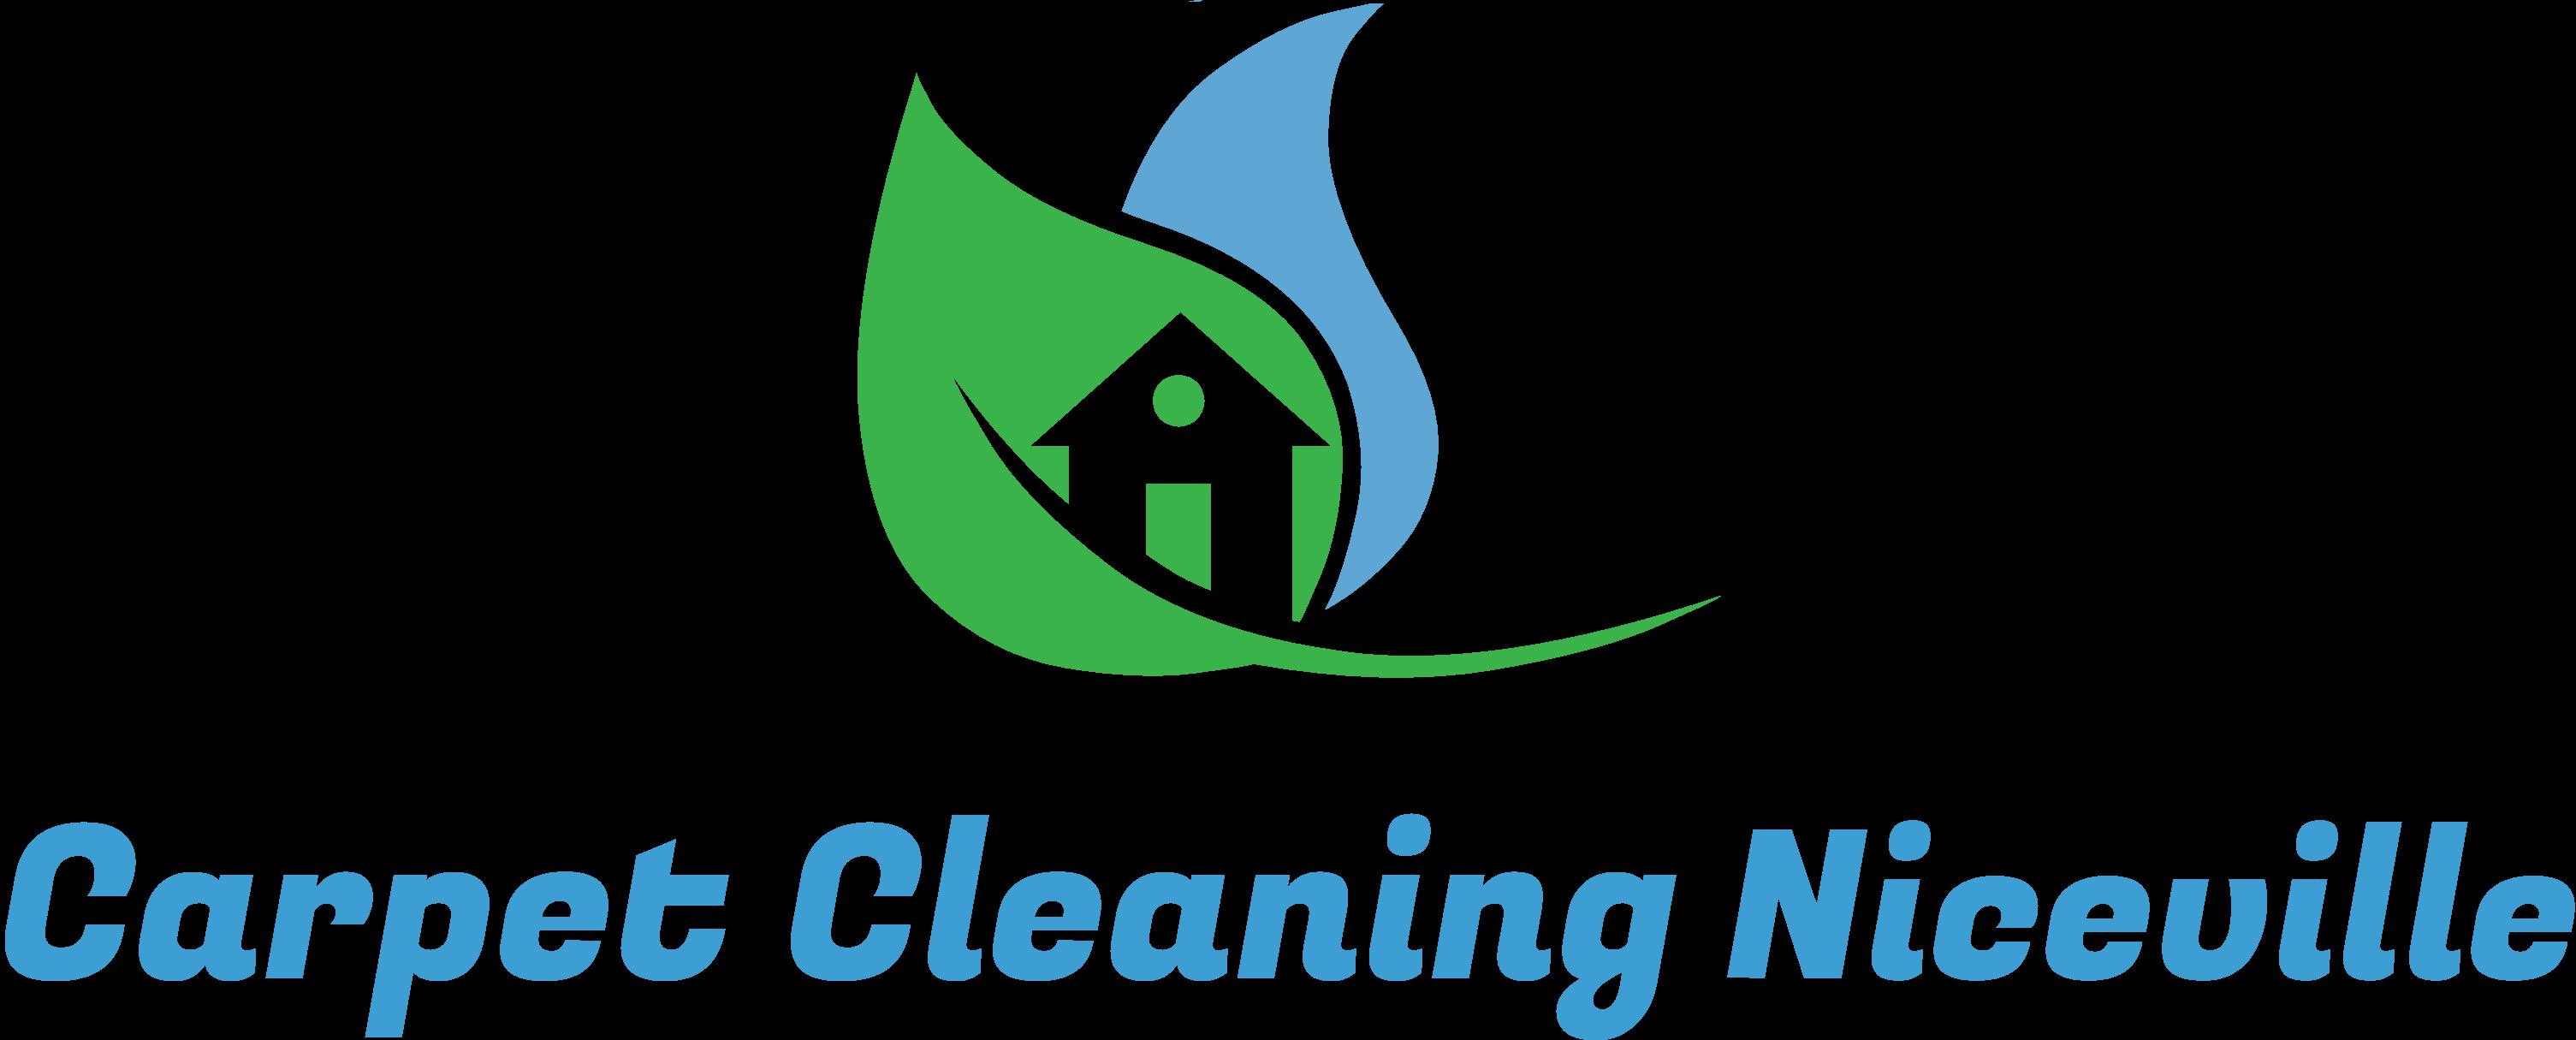 Carpet Cleaning Niceville Logo